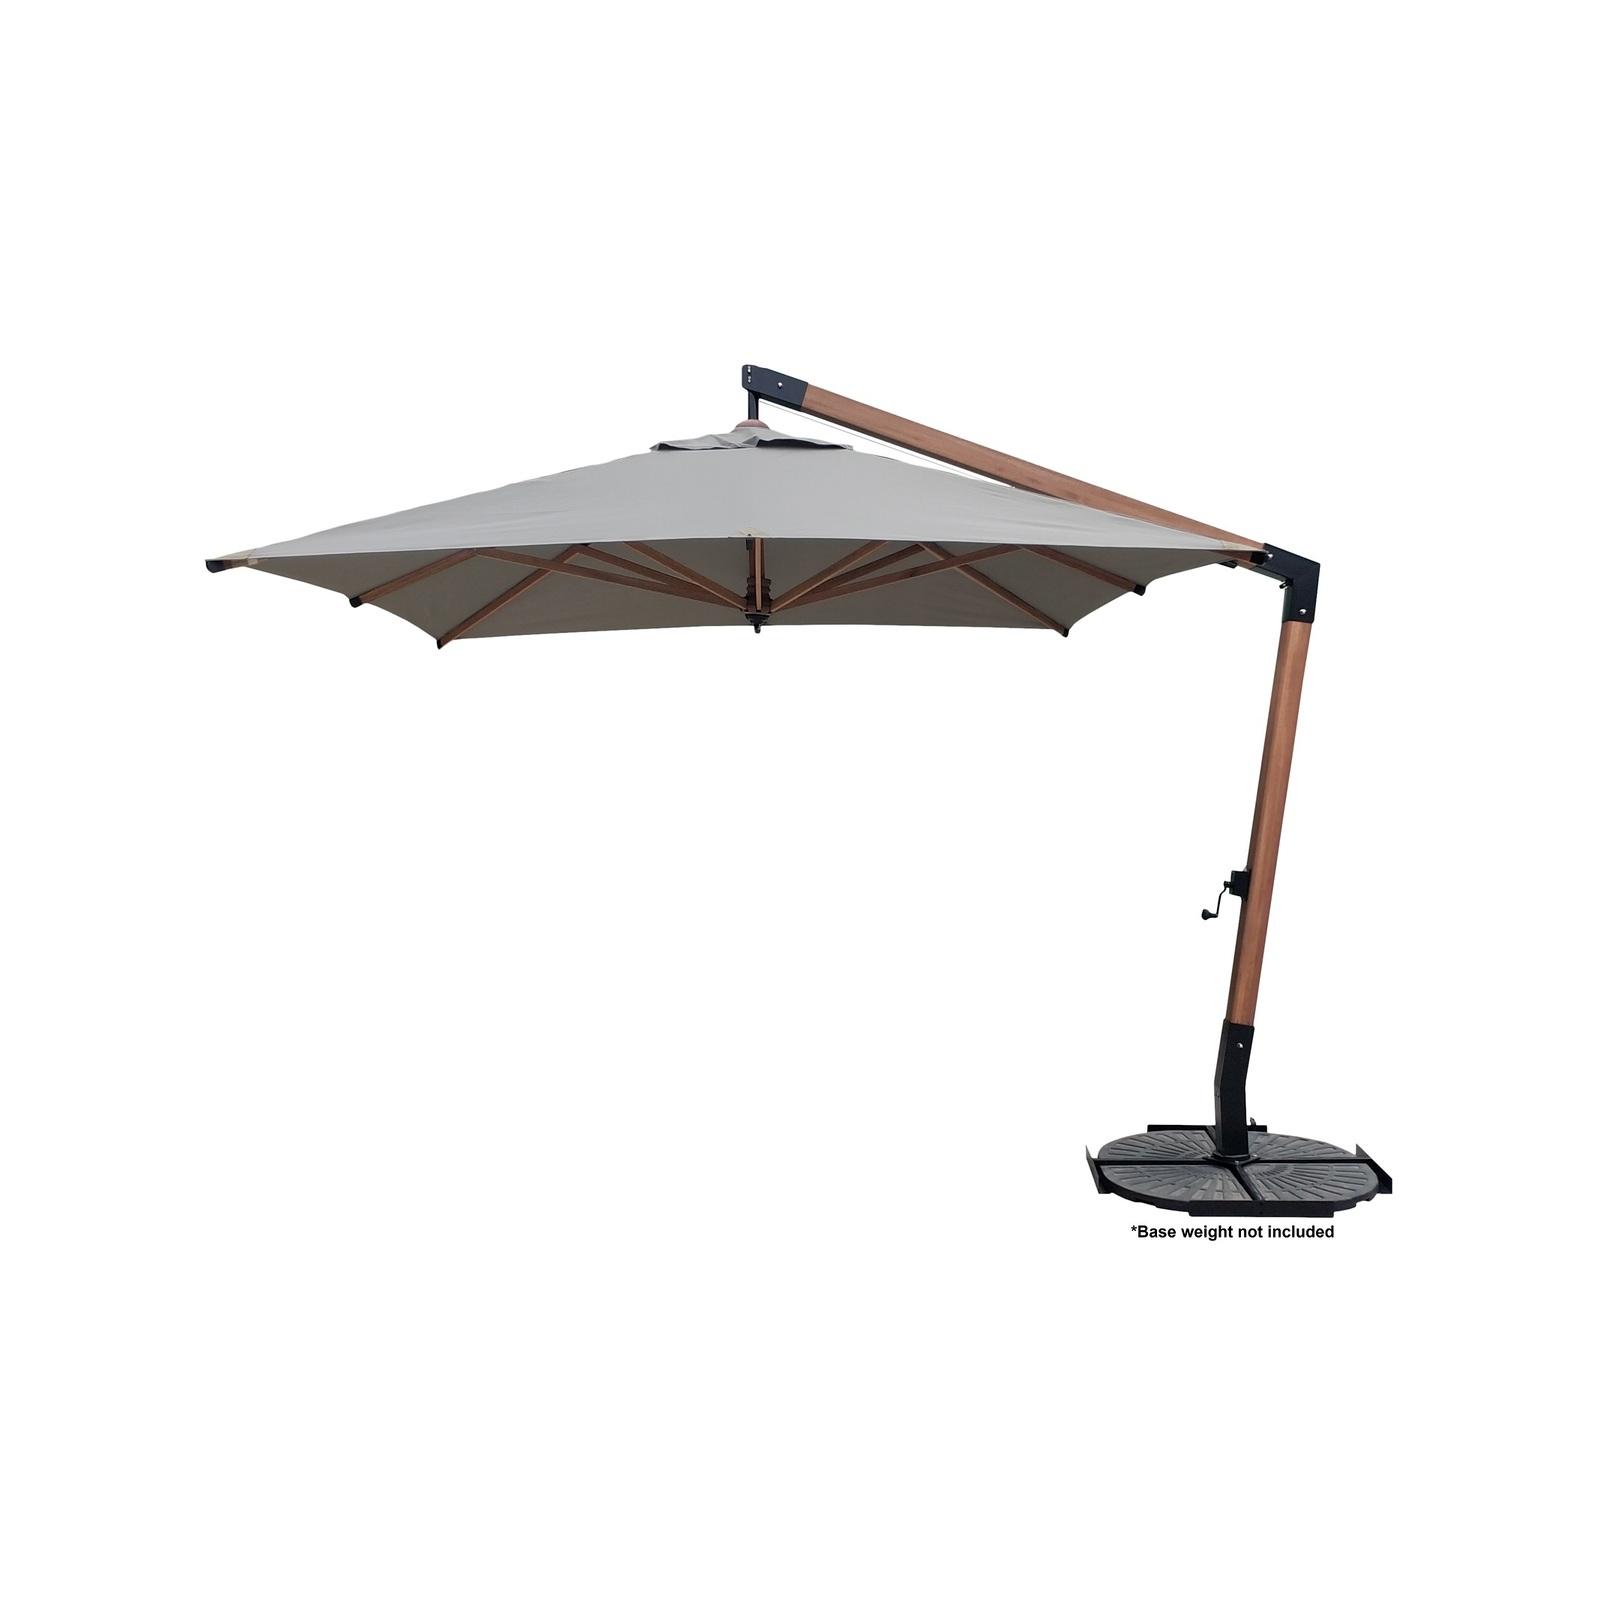 Mimosa 3 x 3m Caymen Wooden Cantilever Umbrella